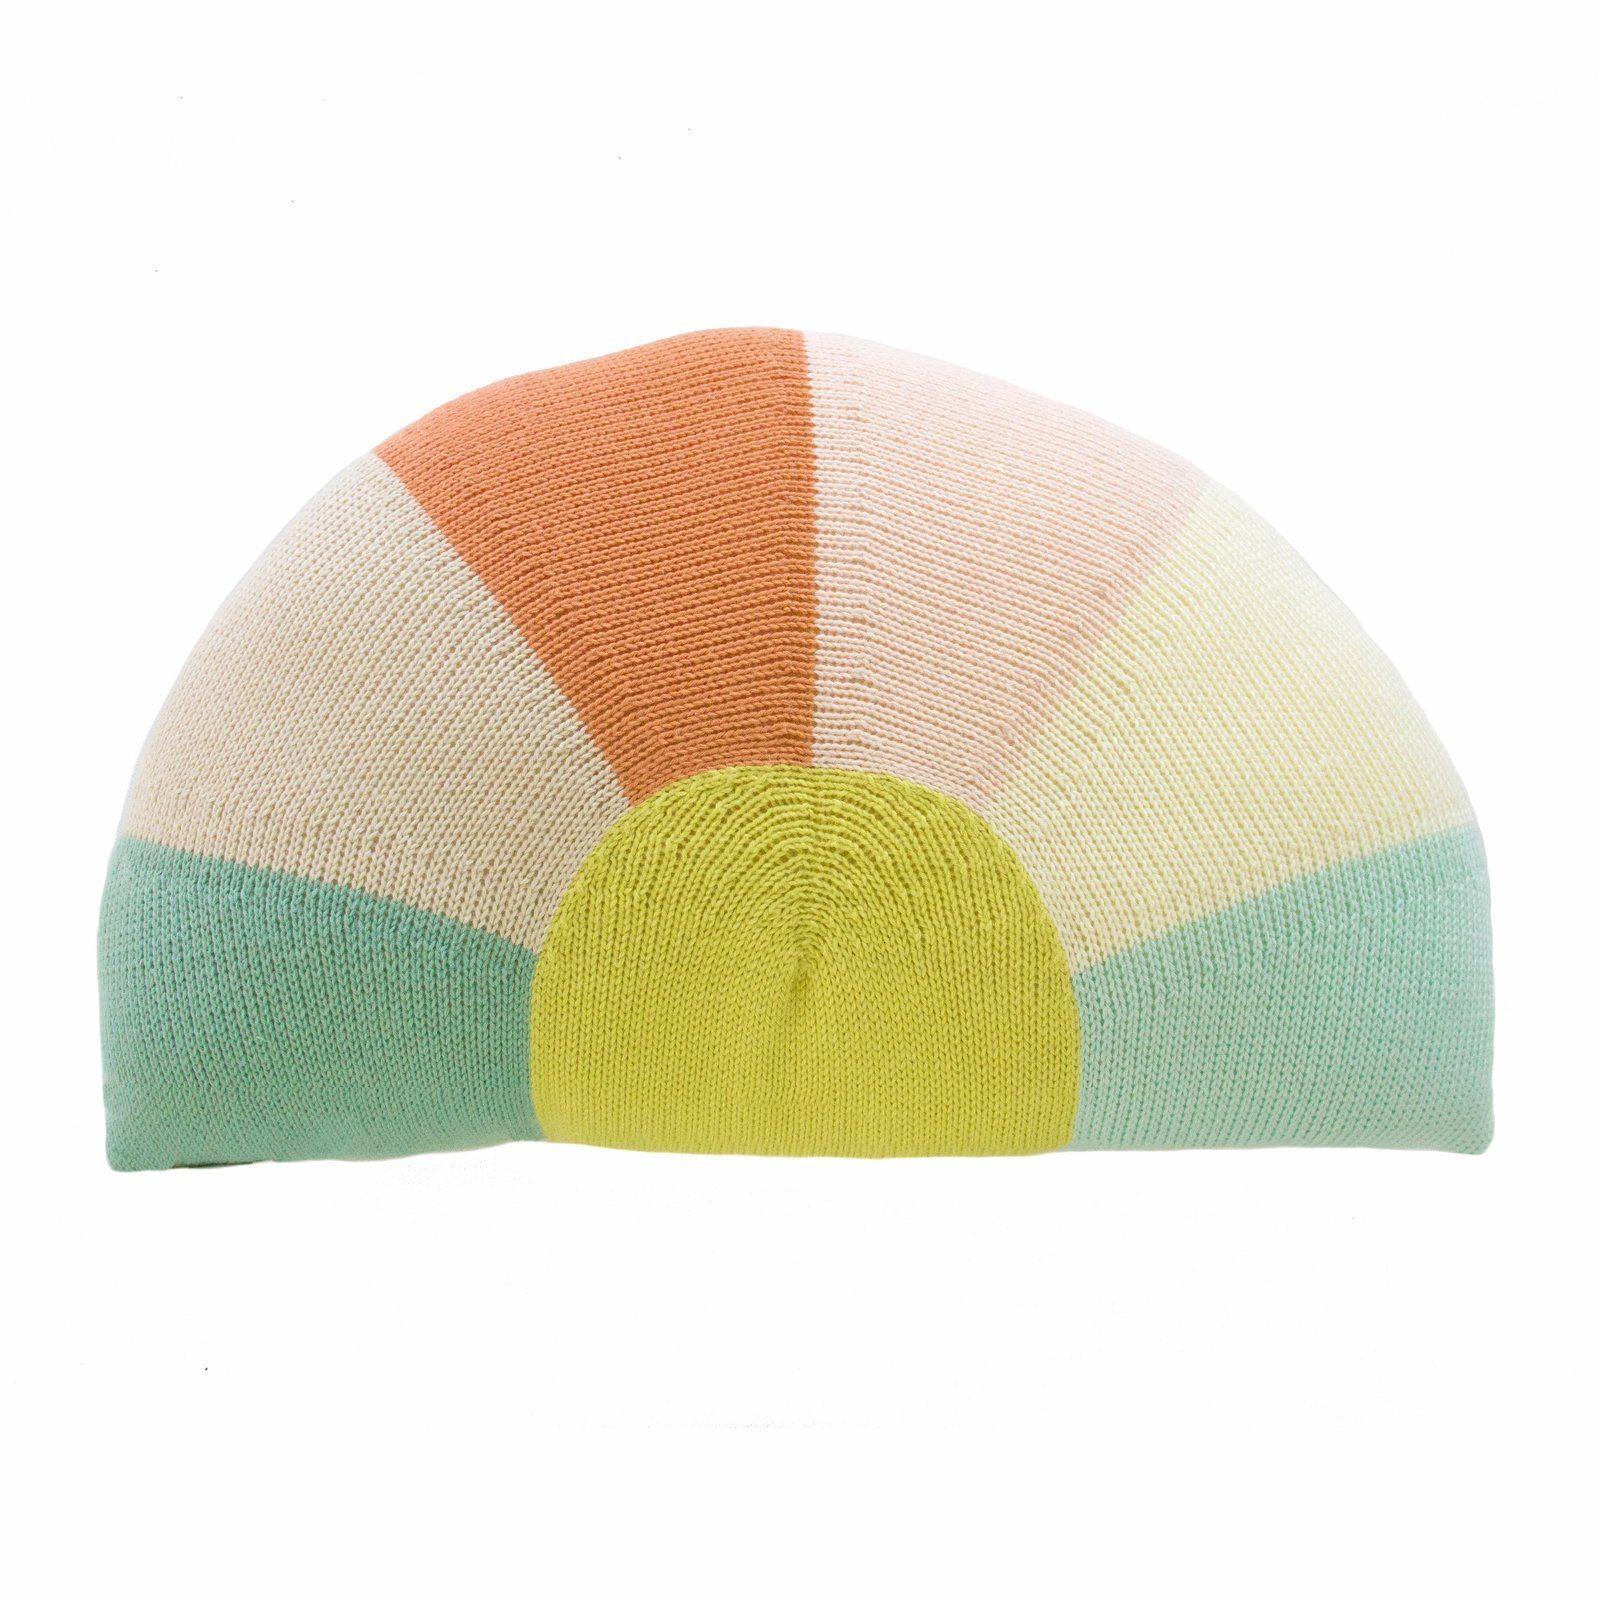 Knit Sunrise Pillow